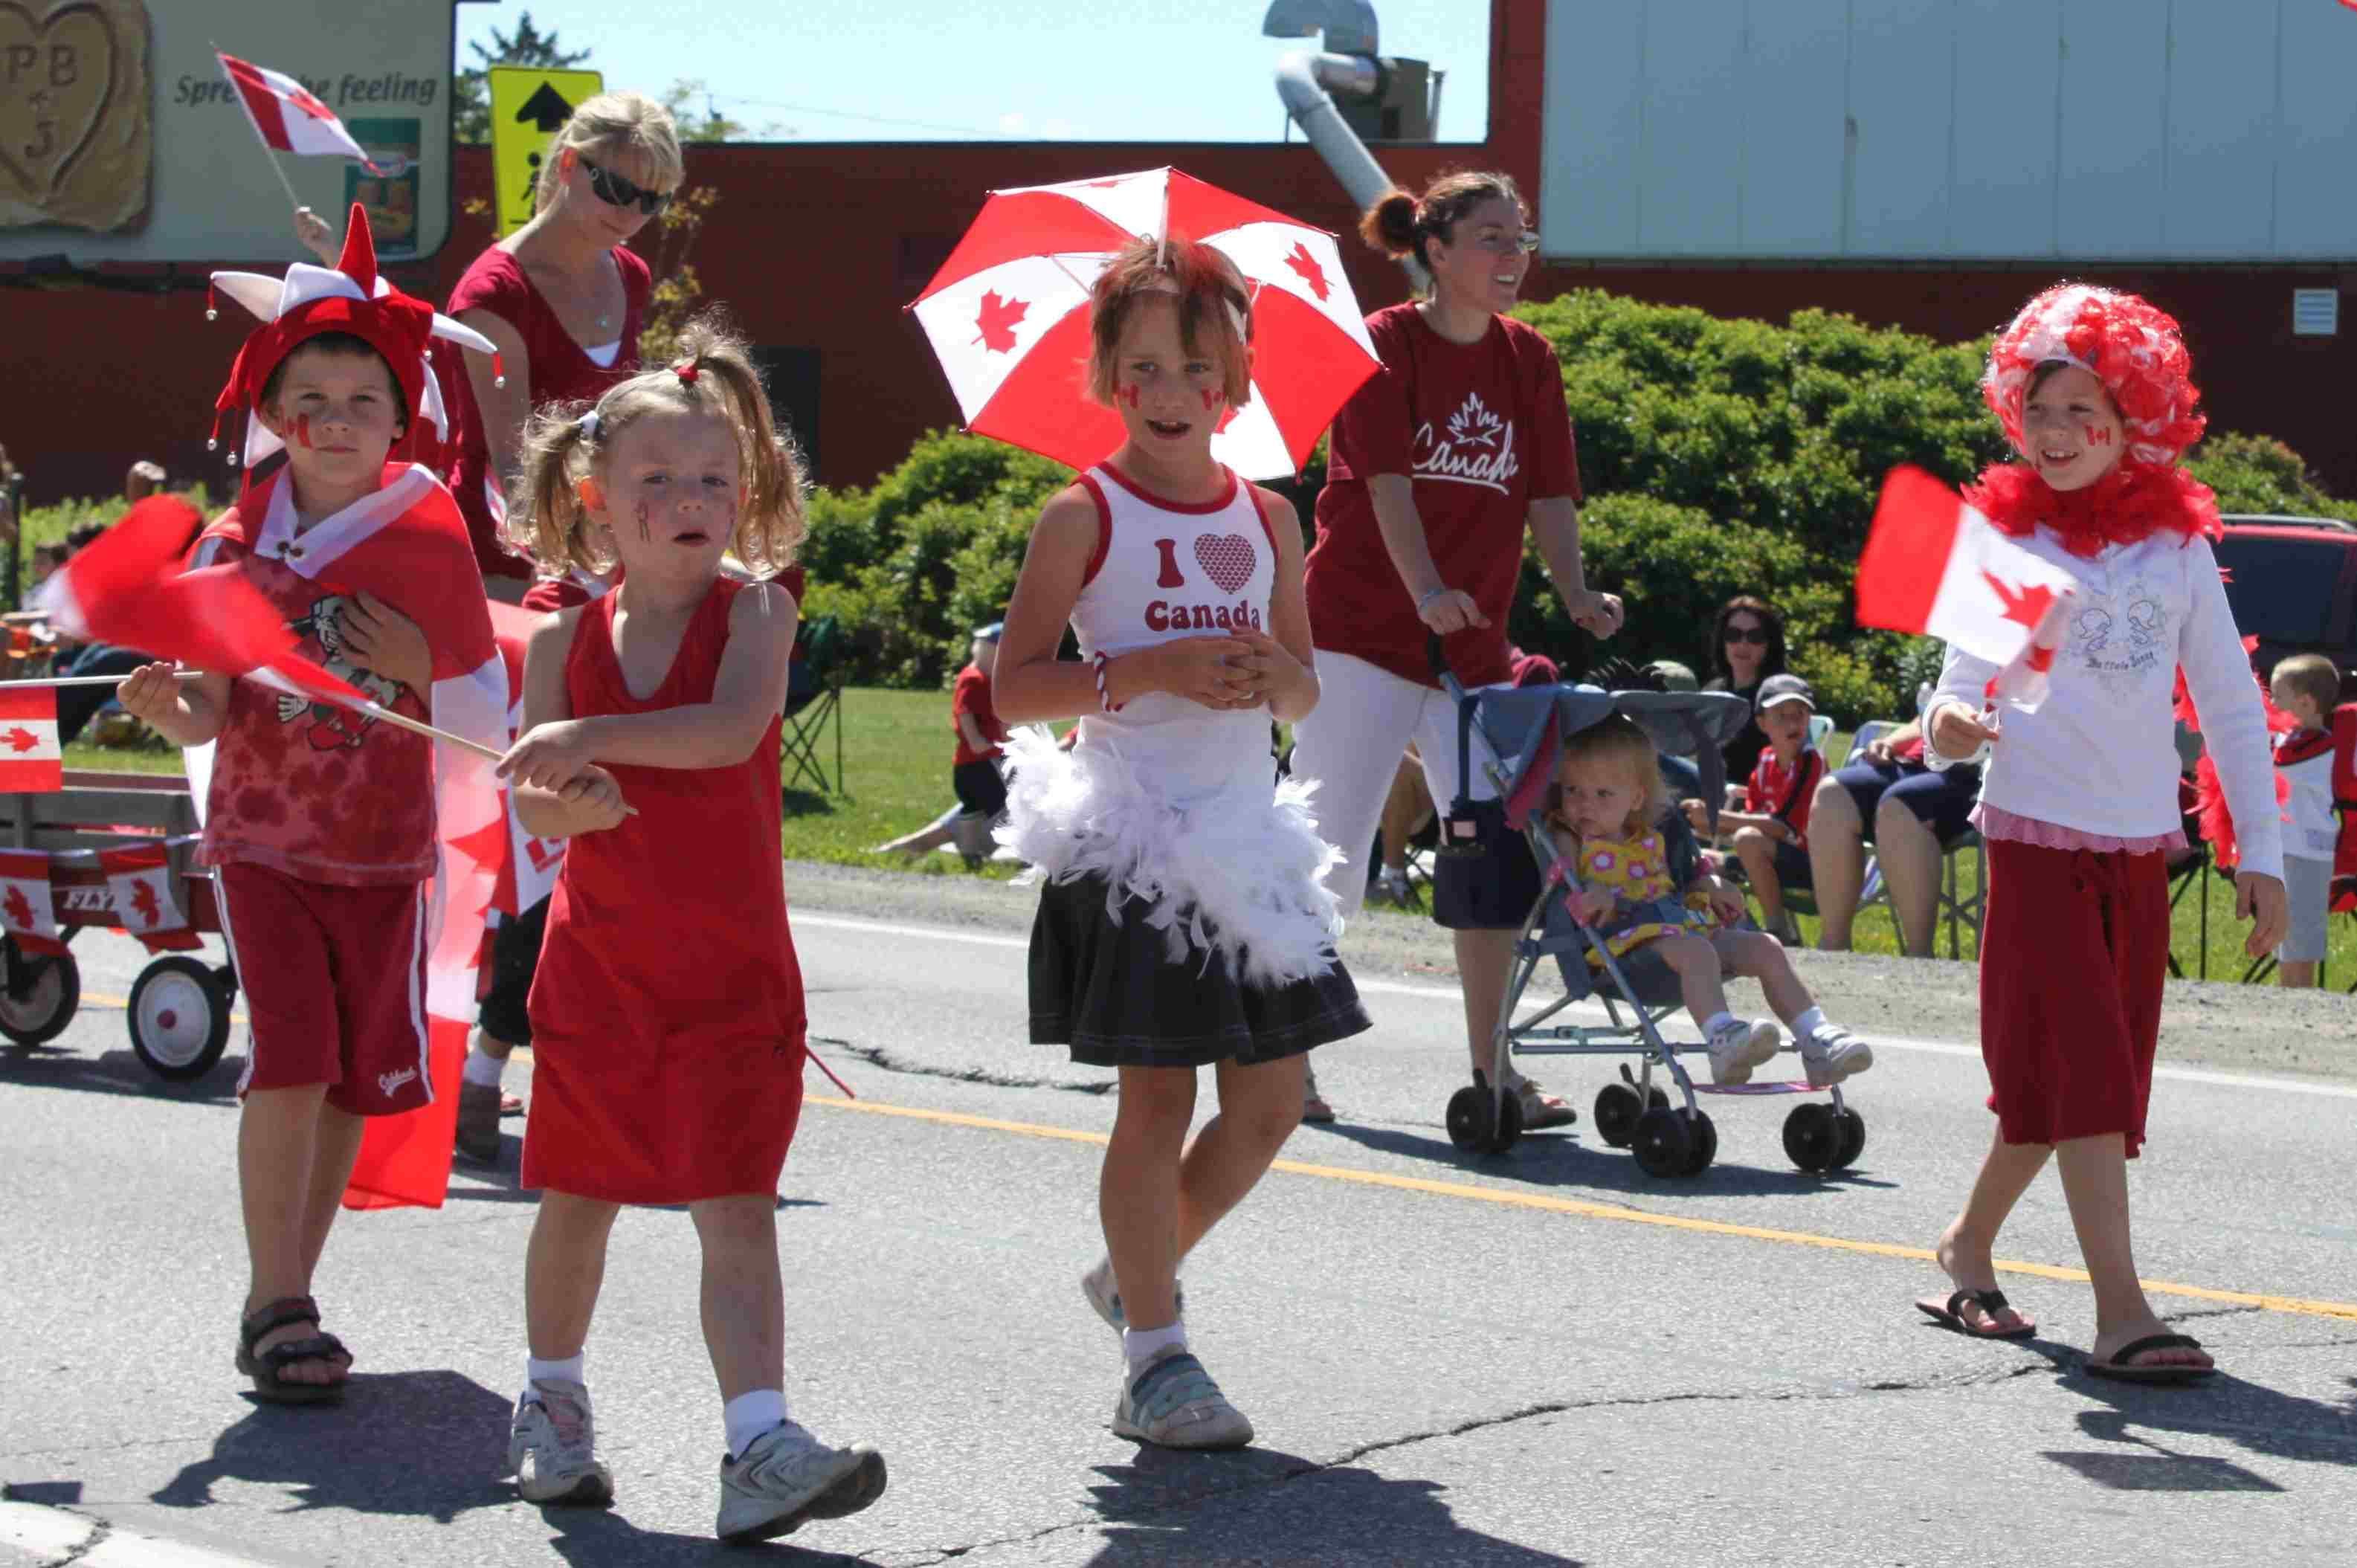 Canadian Day Celebrations Niagara Falls July 1 Http Www Infoniagara Com Events Canada Day Celebrations Aspx Event Niagara Canada Day